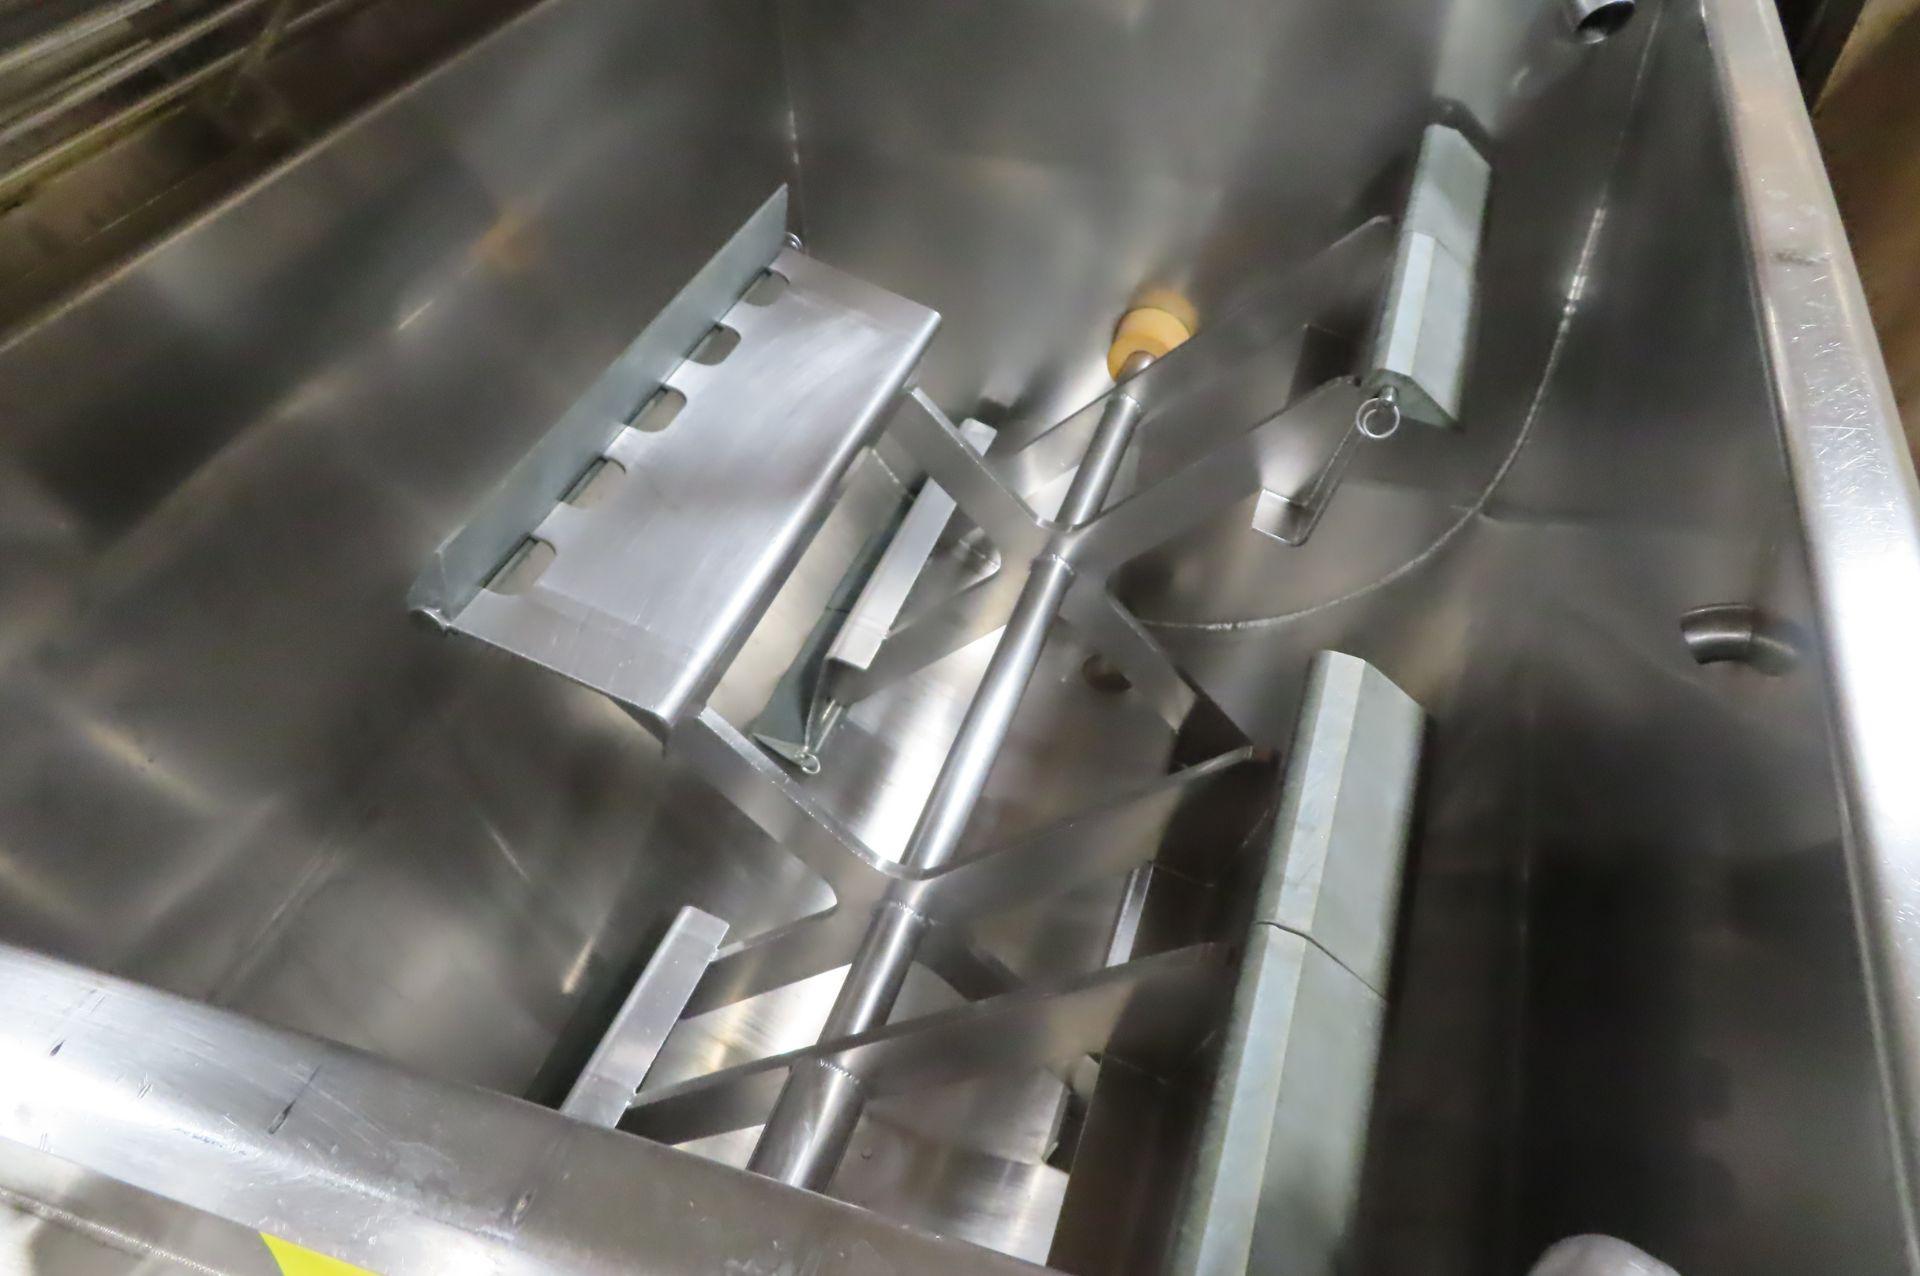 Paddle mixer - Image 4 of 6